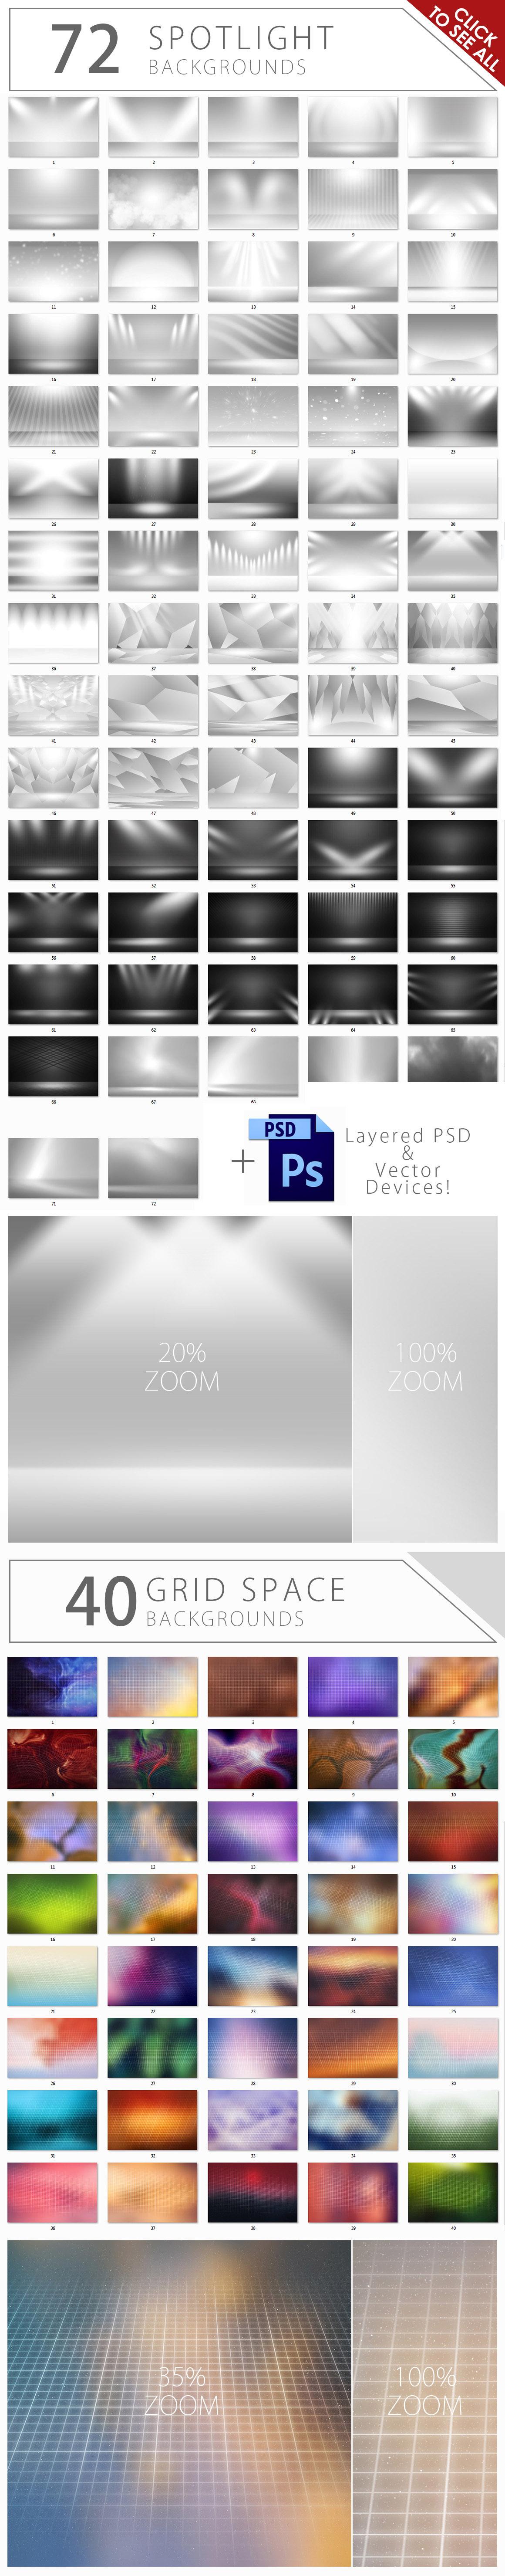 Supermassive Backgrounds Bundle example image 9